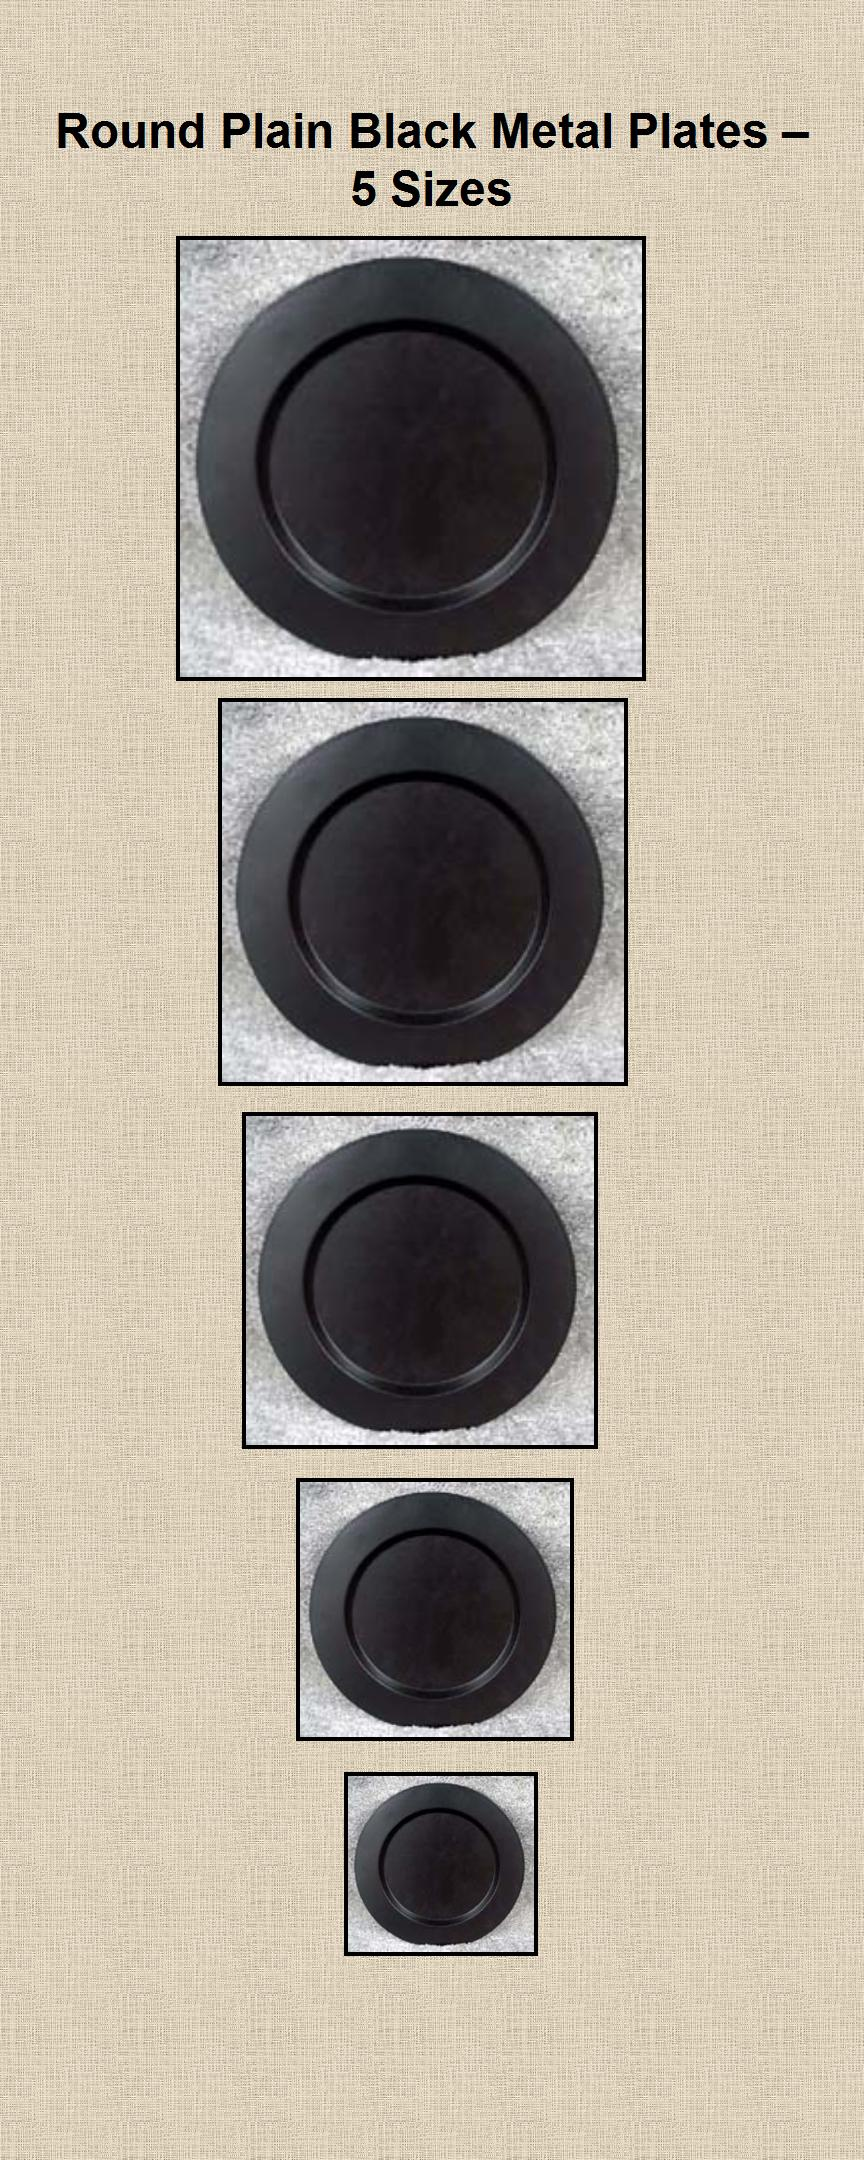 round-plain-black-metal-plates-81120xp.jpg